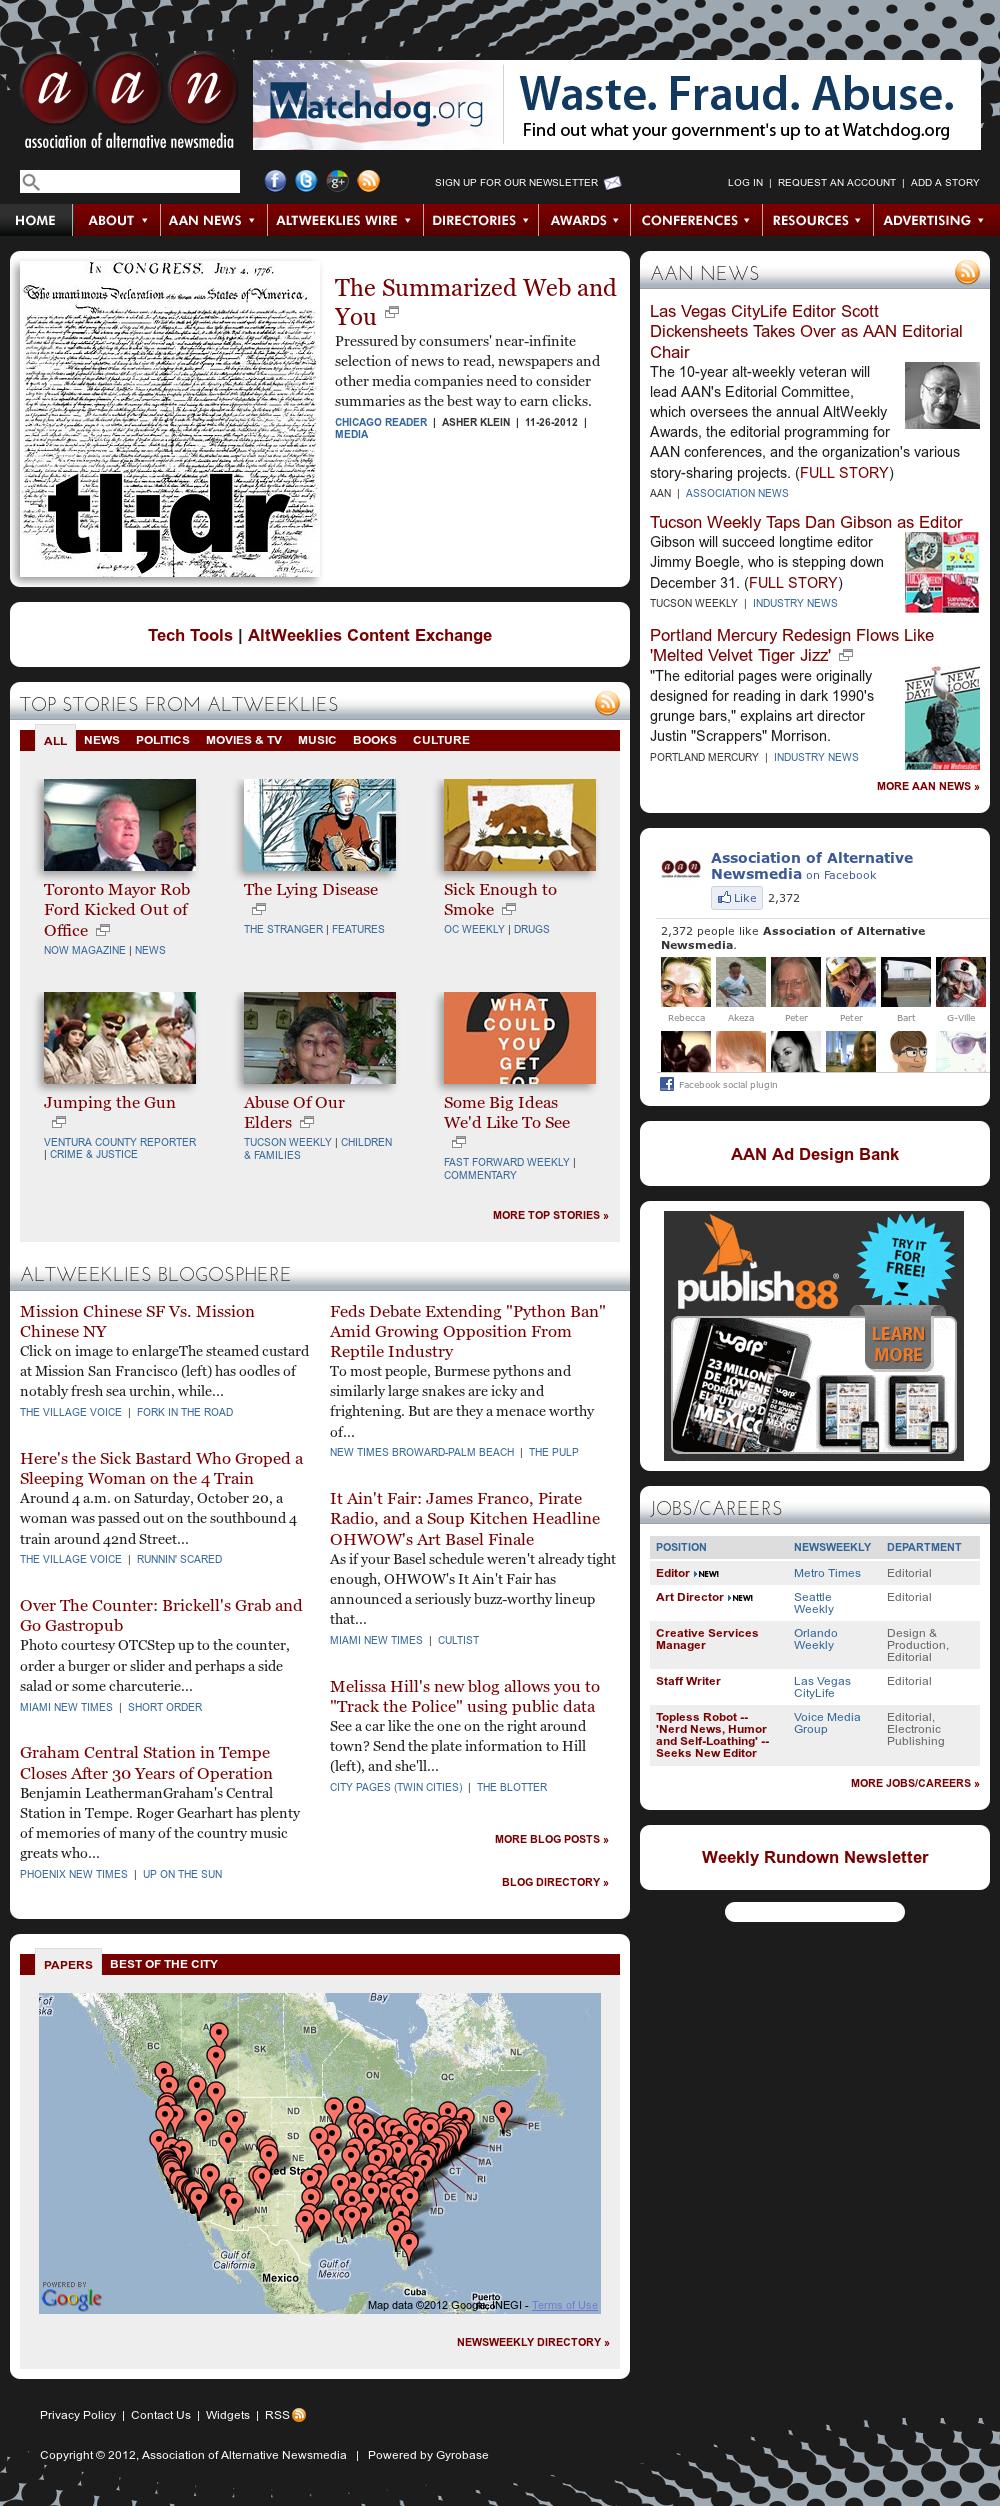 Association of Alternative Newsmedia at Tuesday Nov. 27, 2012, 3:01 p.m. UTC